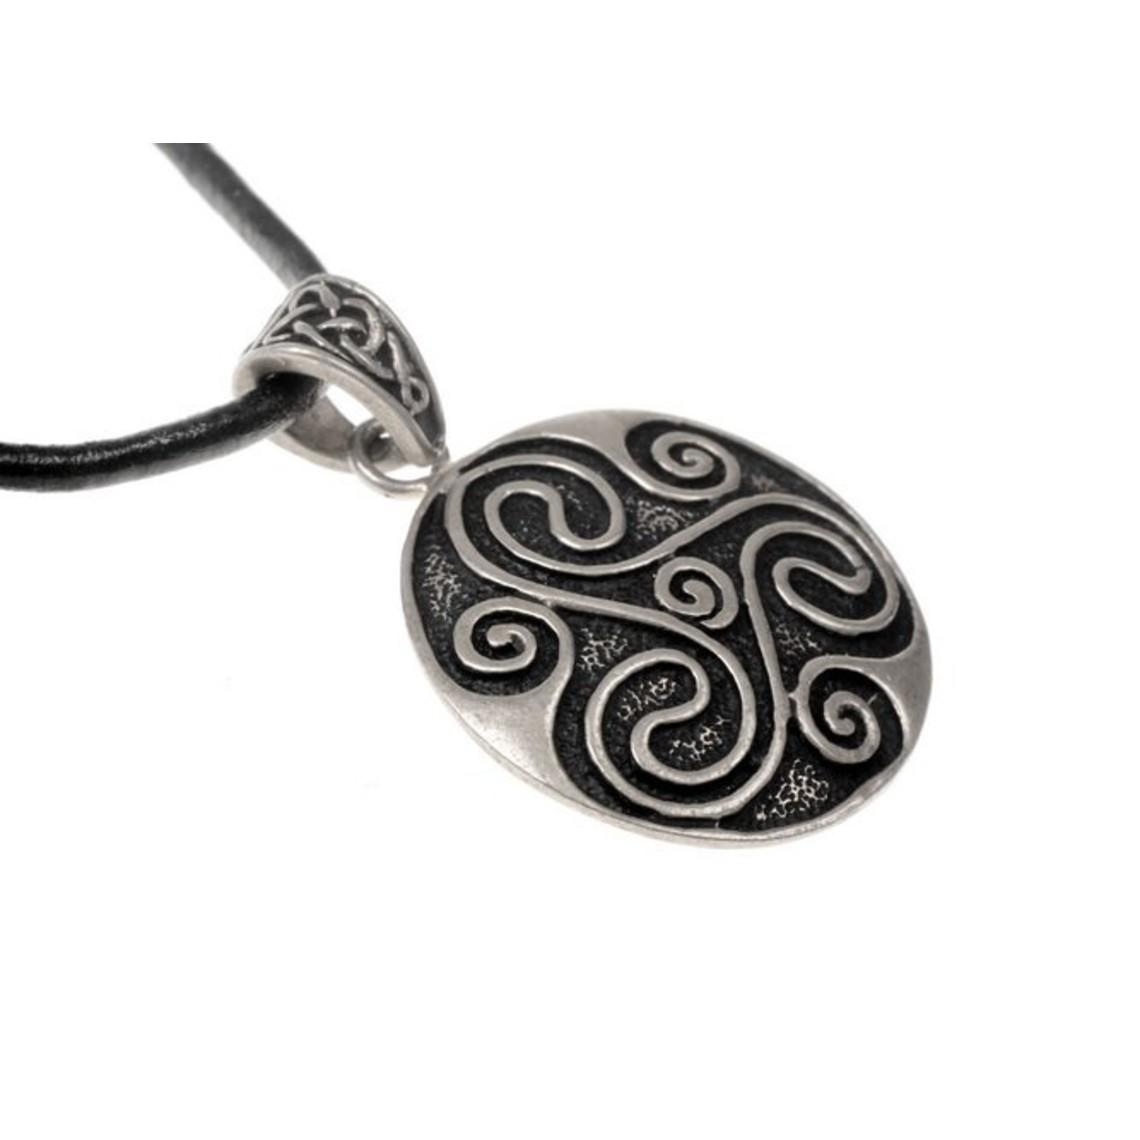 Amuleto trisquelion celta, plateado